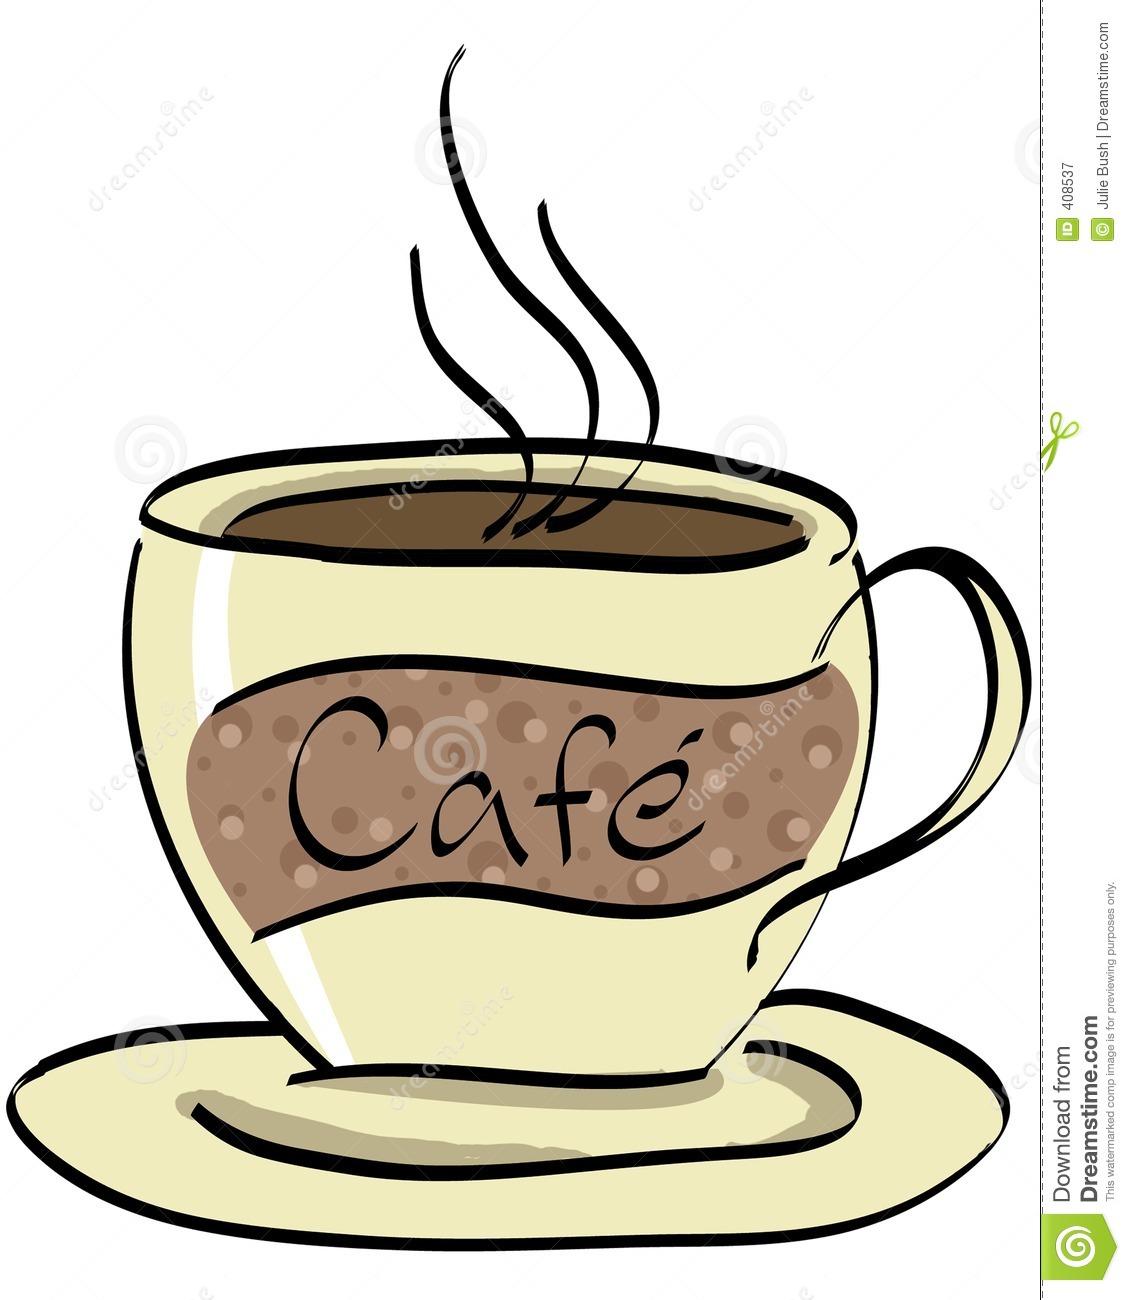 1130x1300 Food Clipart Coffee